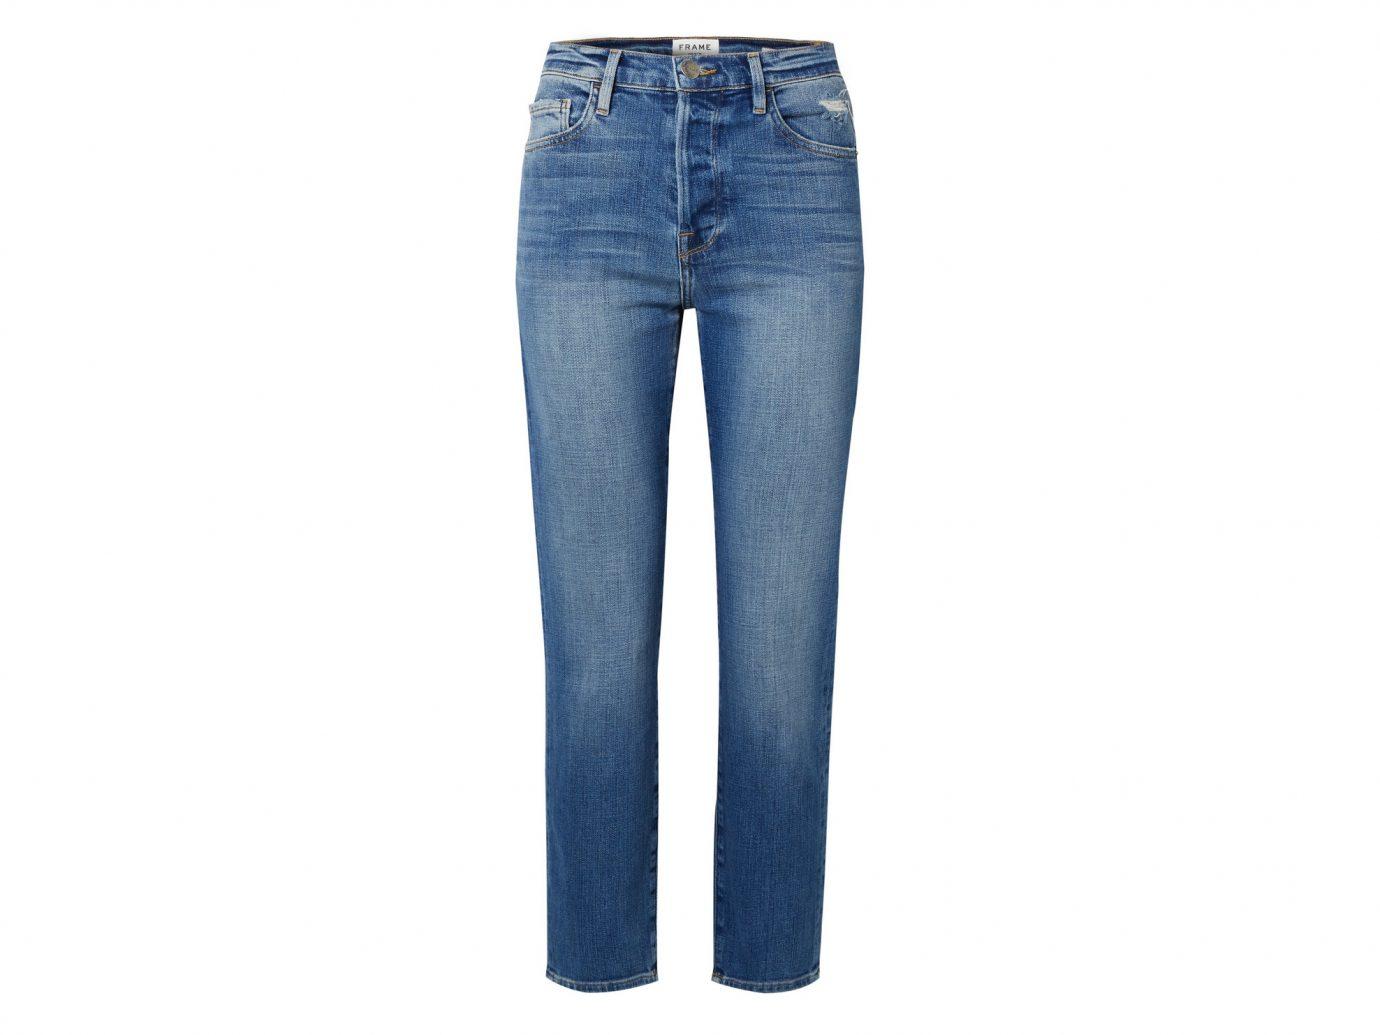 Frane Le Original cropped high-rise straight-leg jean